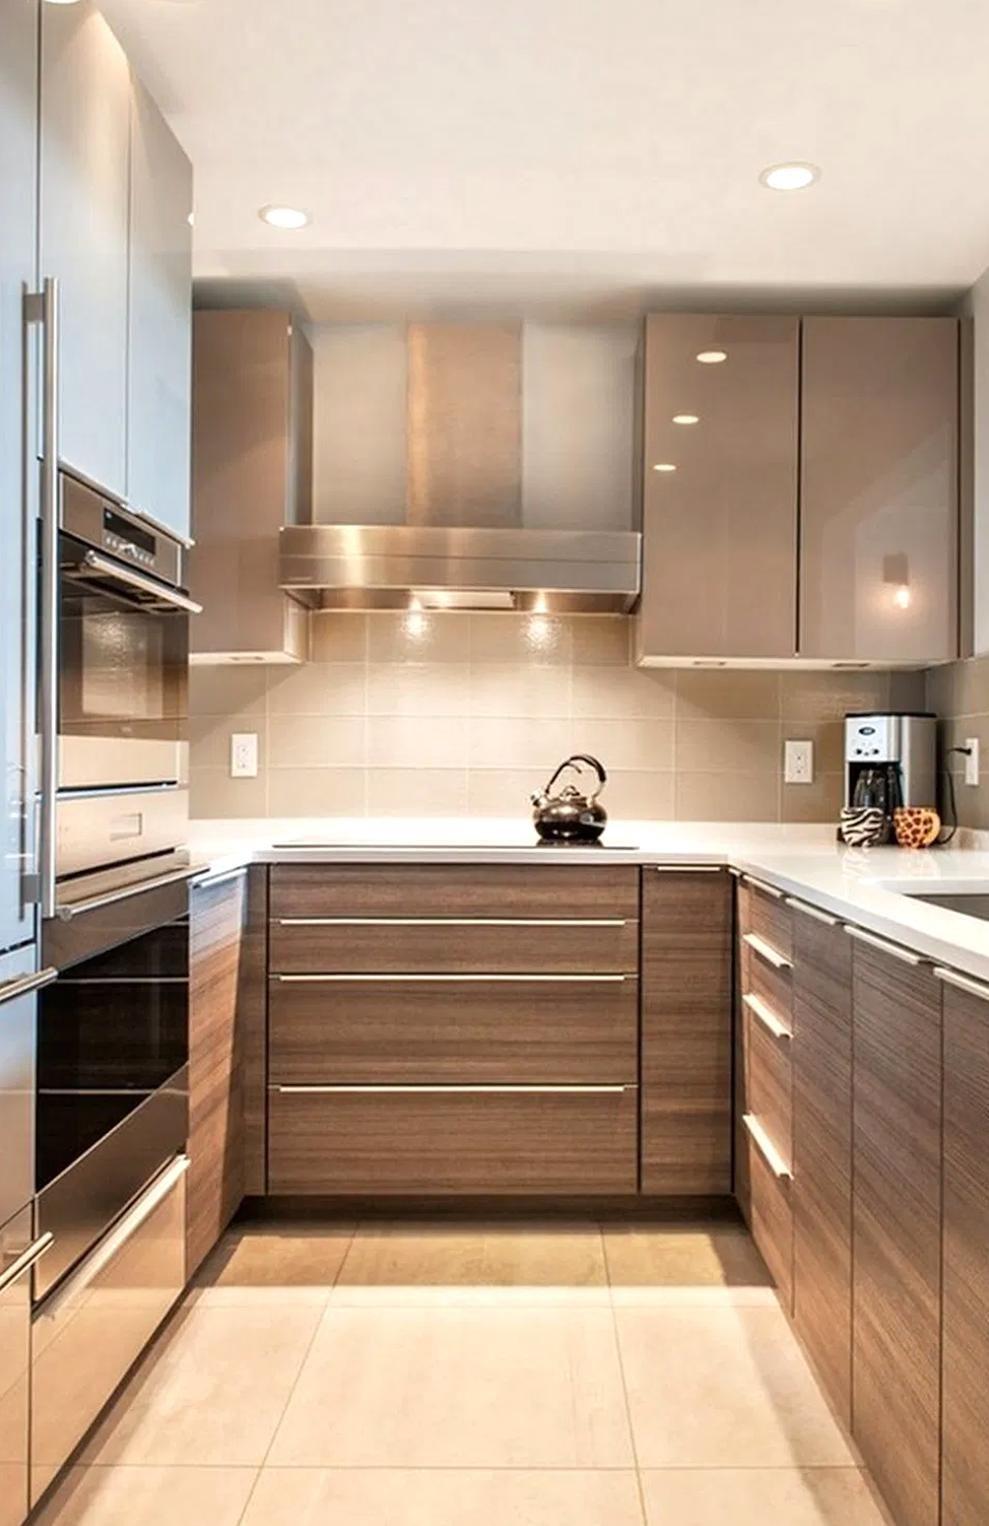 Now Trending Minimalist Kitchen Design See Our Top 10 Picks For Best Minimalist Kitchen In 2020 Small Modern Kitchens Kitchen Remodel Small Contemporary Kitchen Design